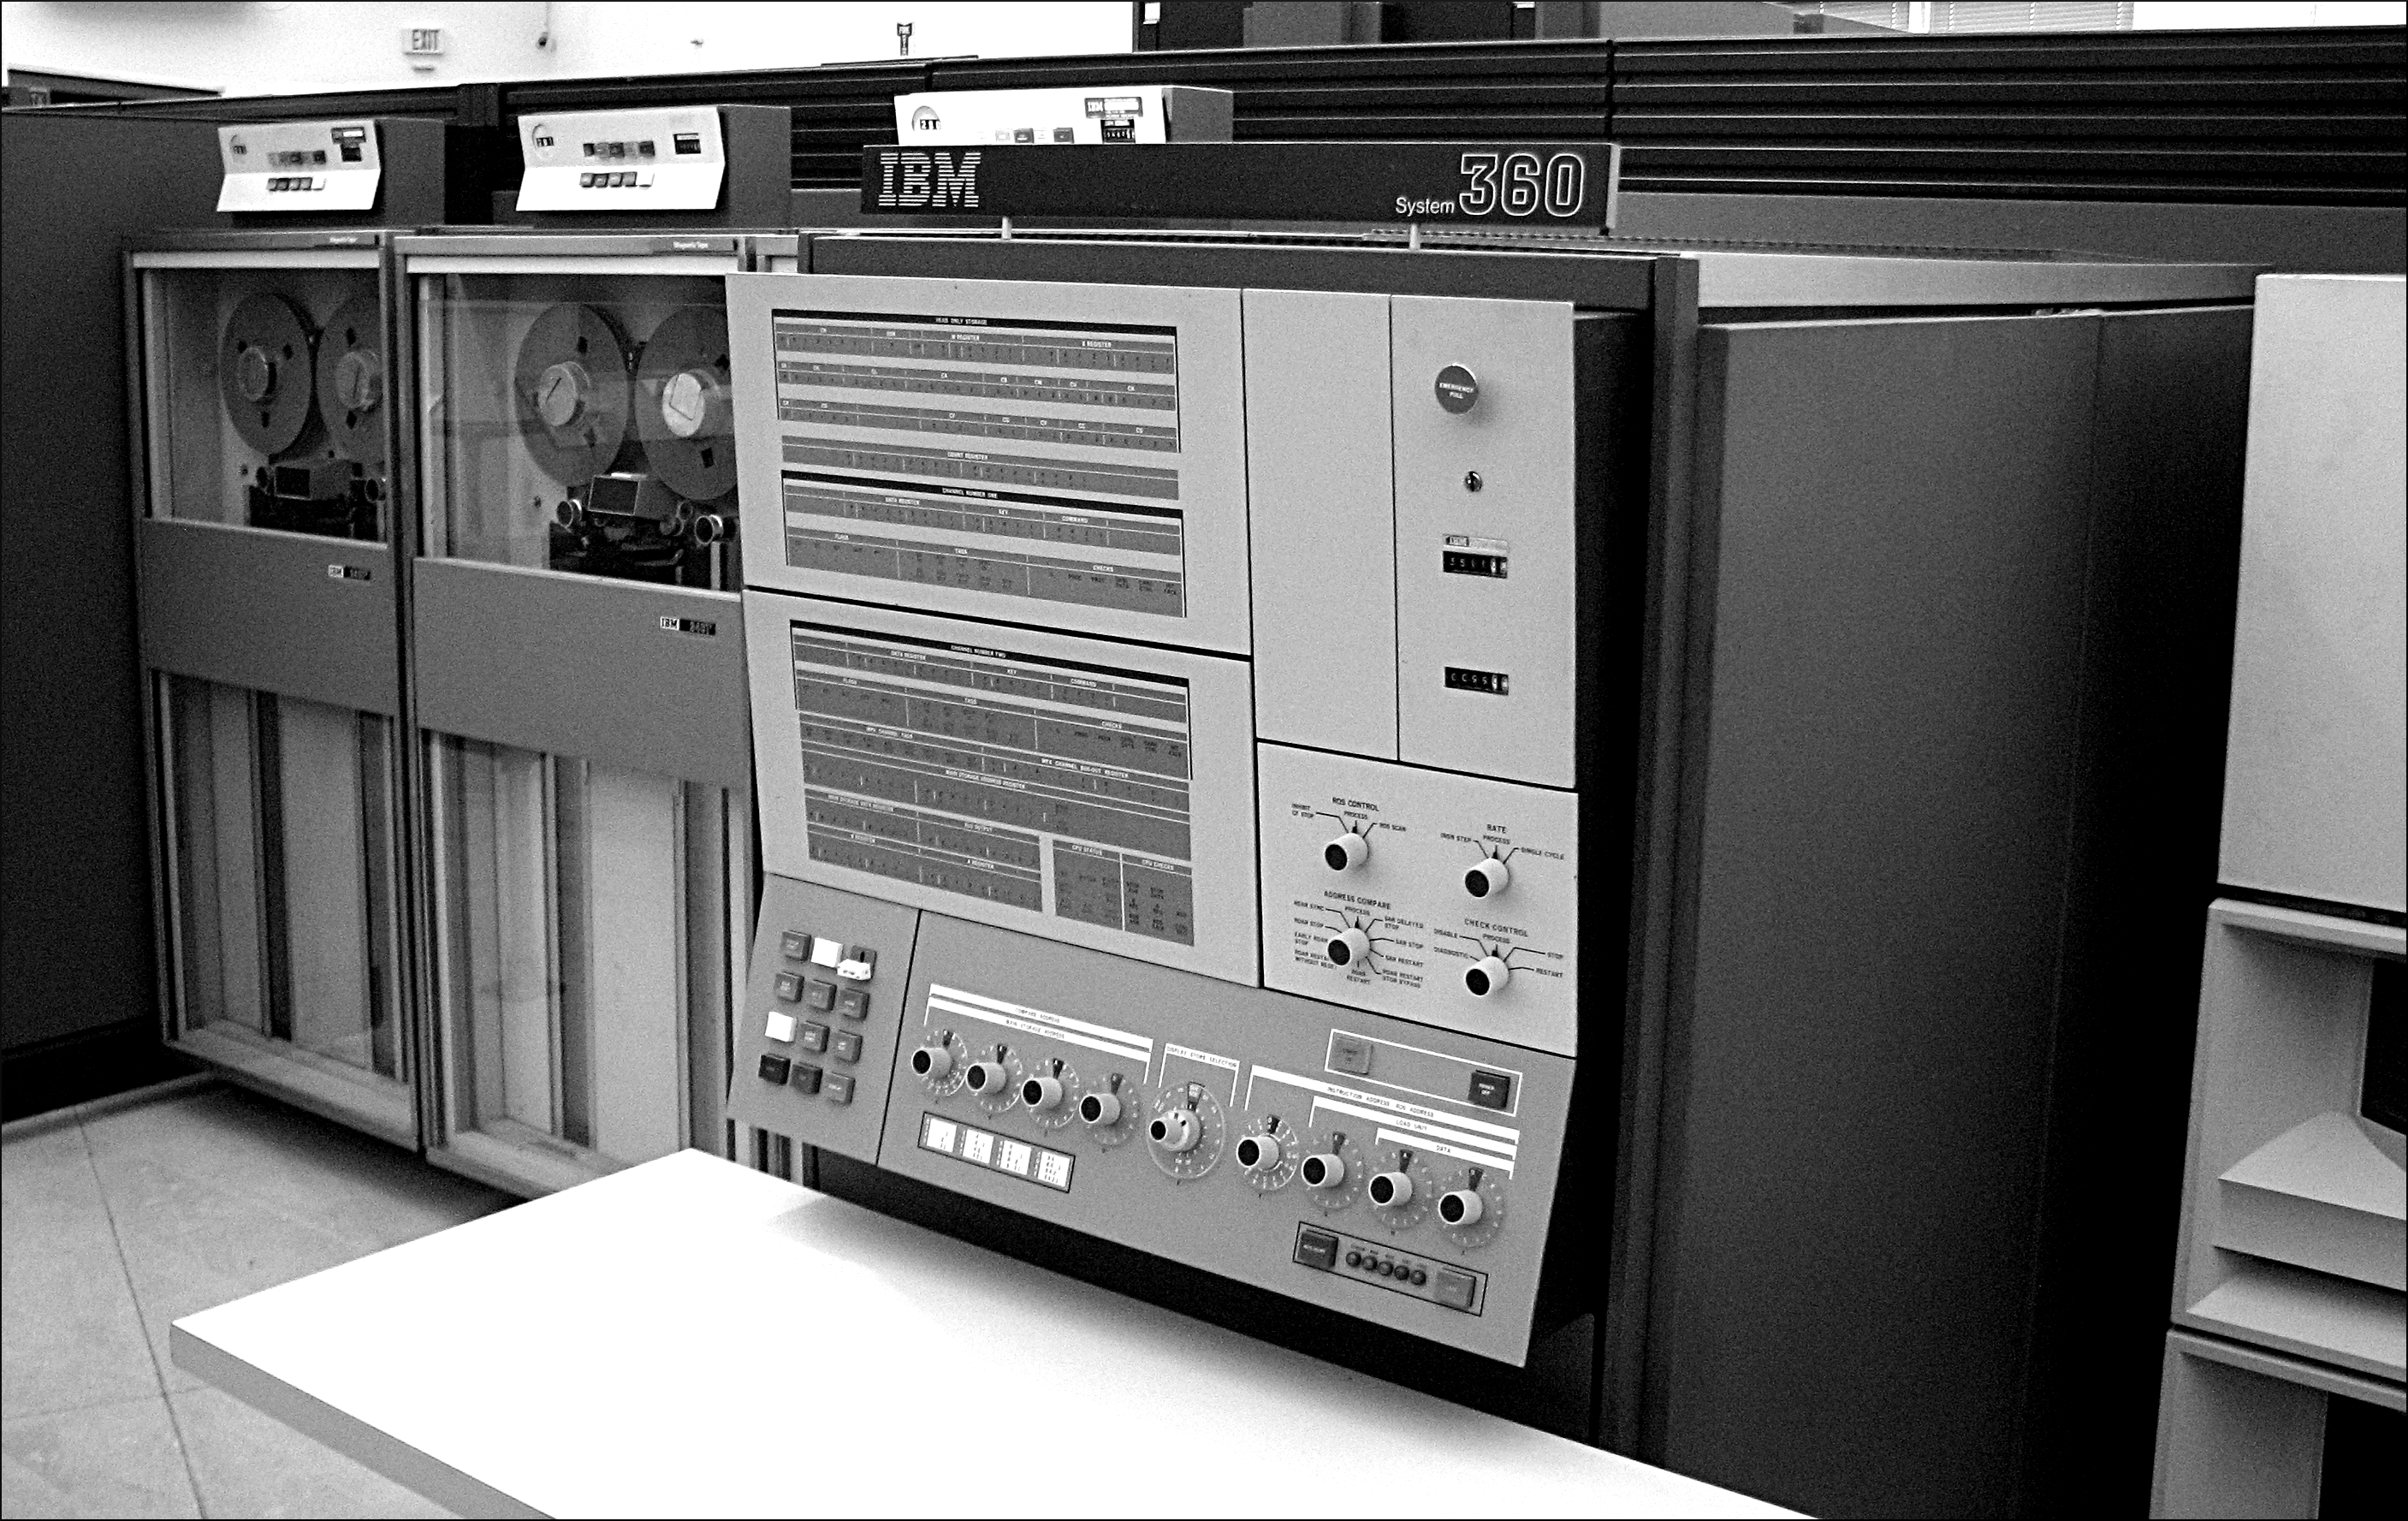 TEX/images/IBM_System360_Mainframe.jpg